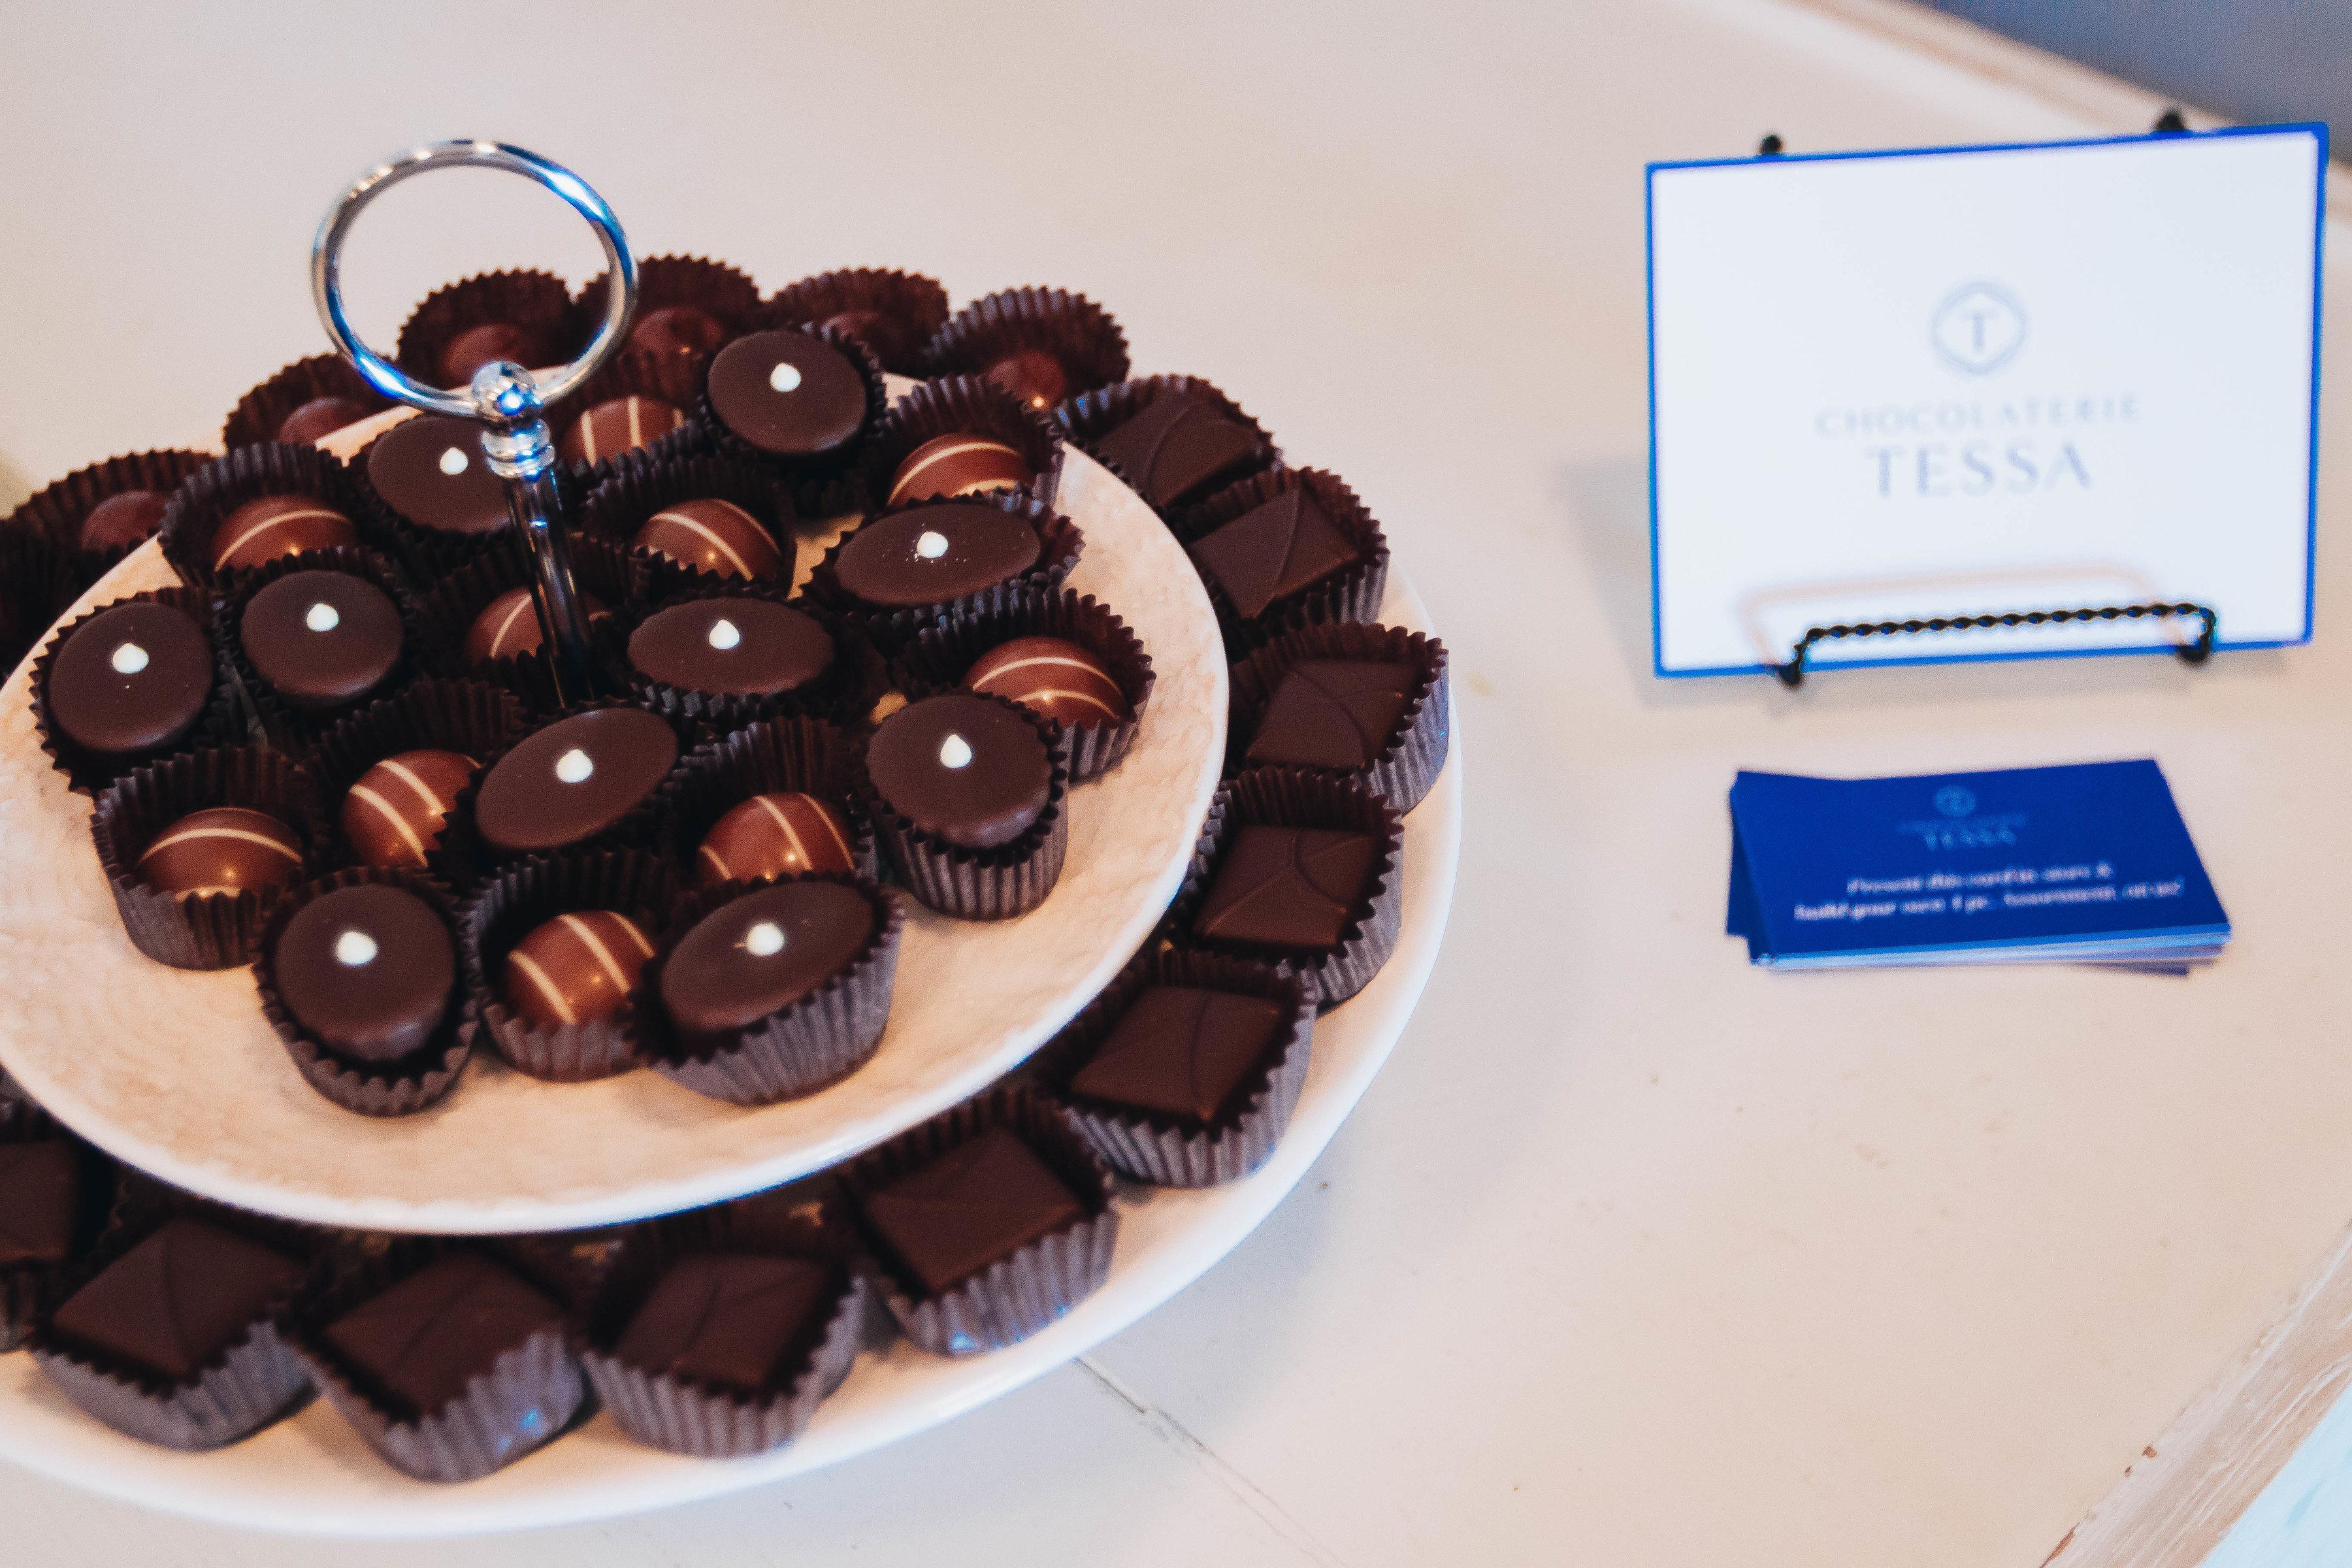 chocolaterie-tessa